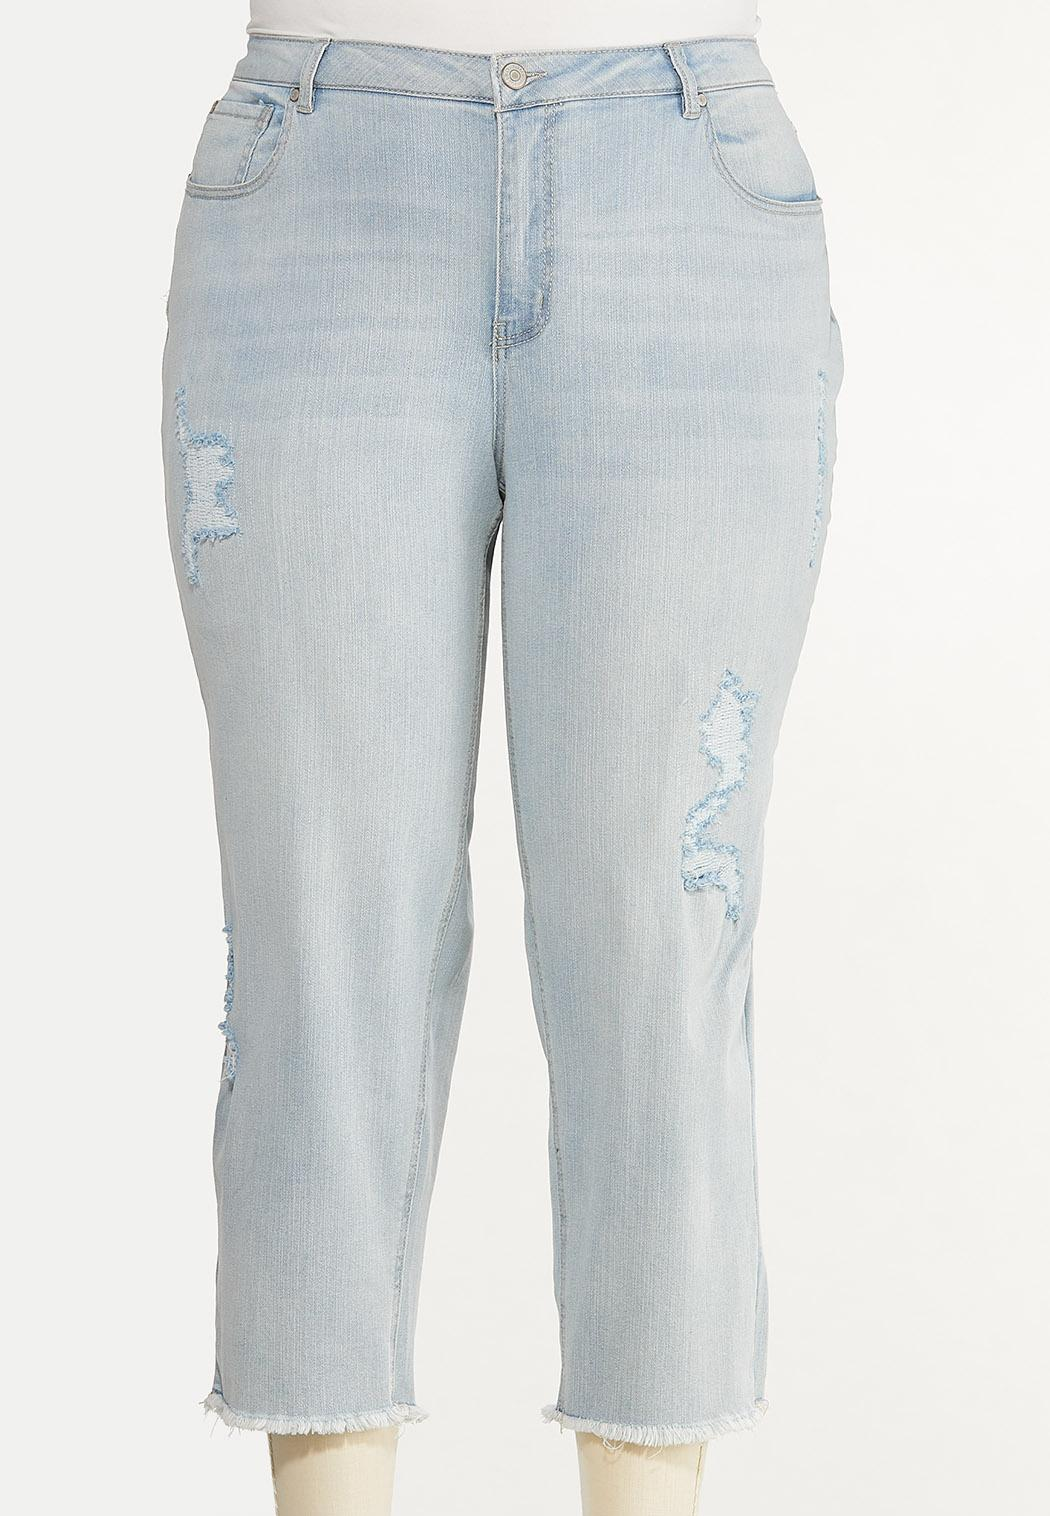 Plus Size Distressed Lightwash Jeans